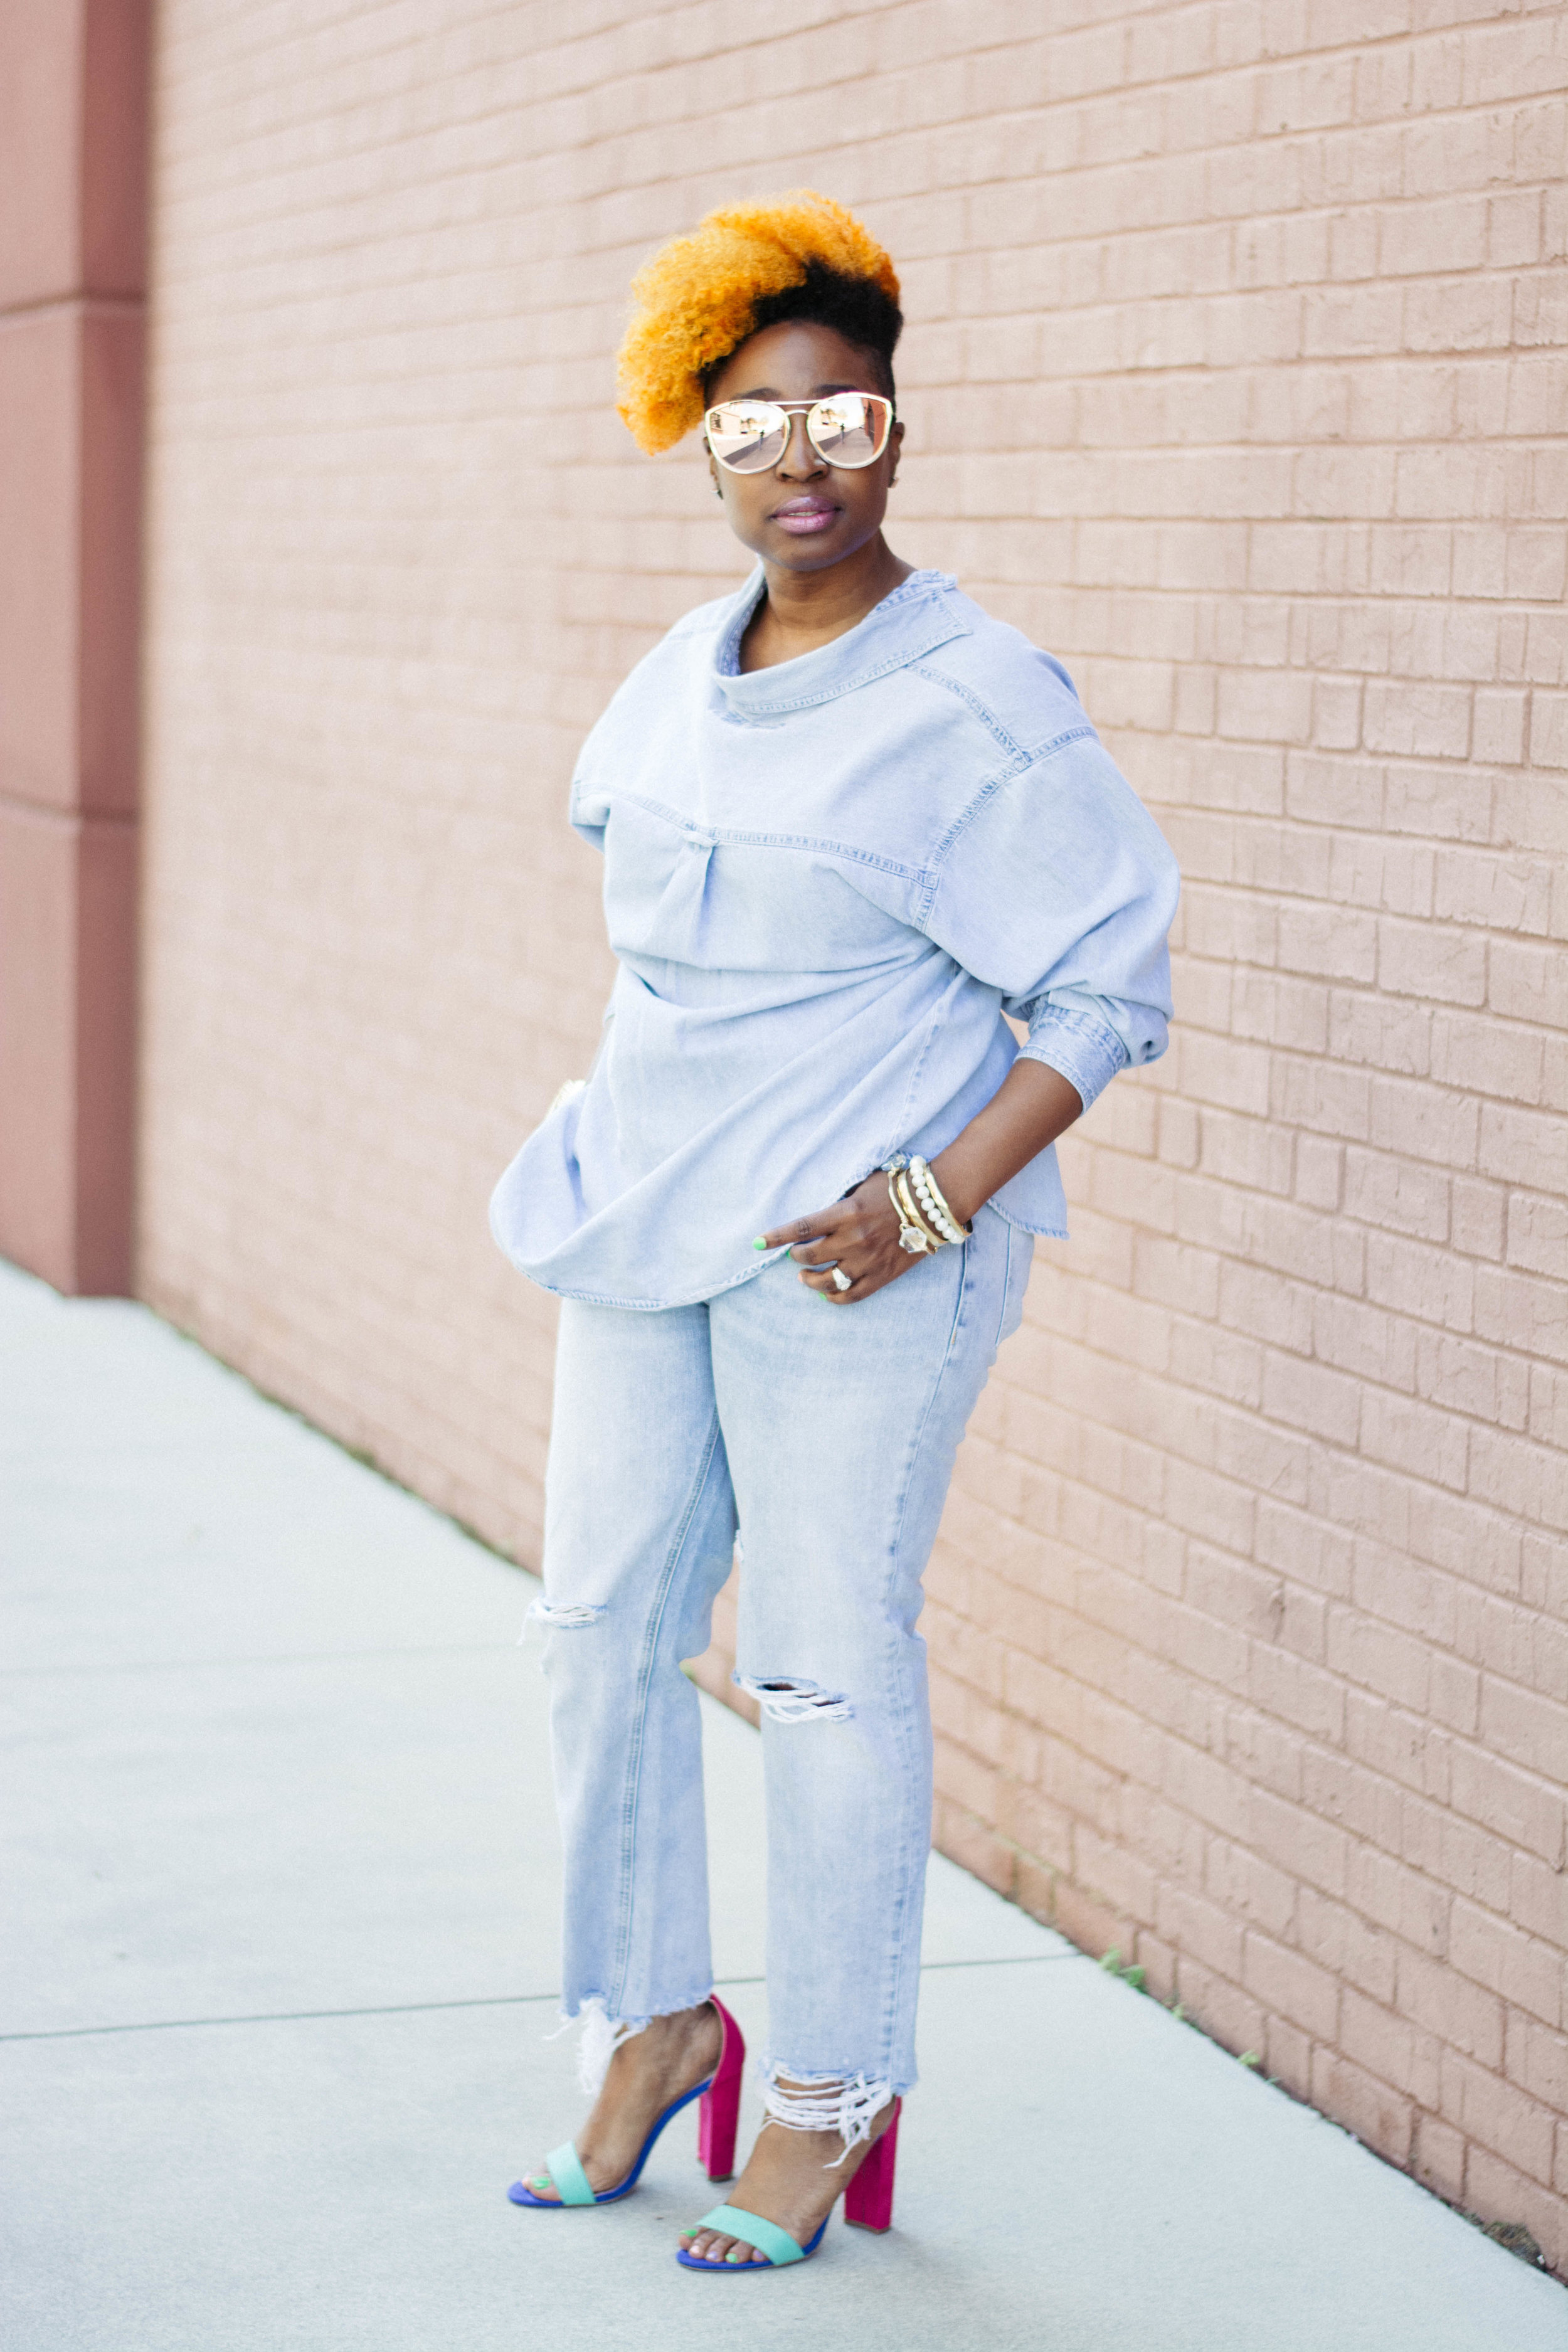 Melodie Stewart, The Style Klazit, Denim on denim, wearing shirt backwards, distressed jeans, Atlanta style blogger